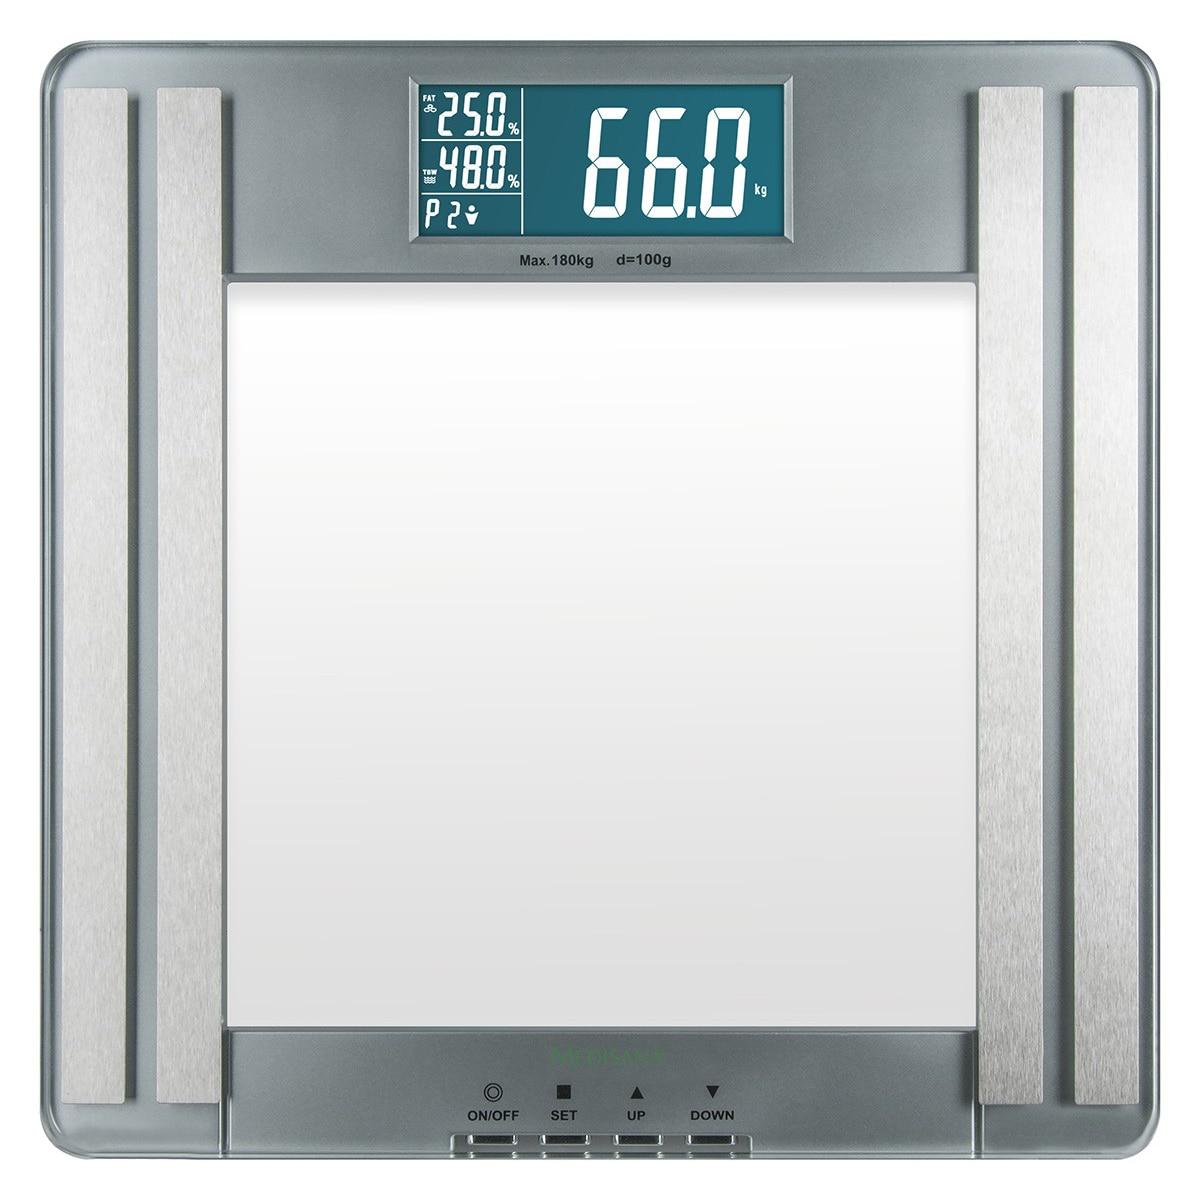 Fotografie Cantar electronic cu analizator corporal Medisana PSM, 180 kg, 10 memorii, Argintiu